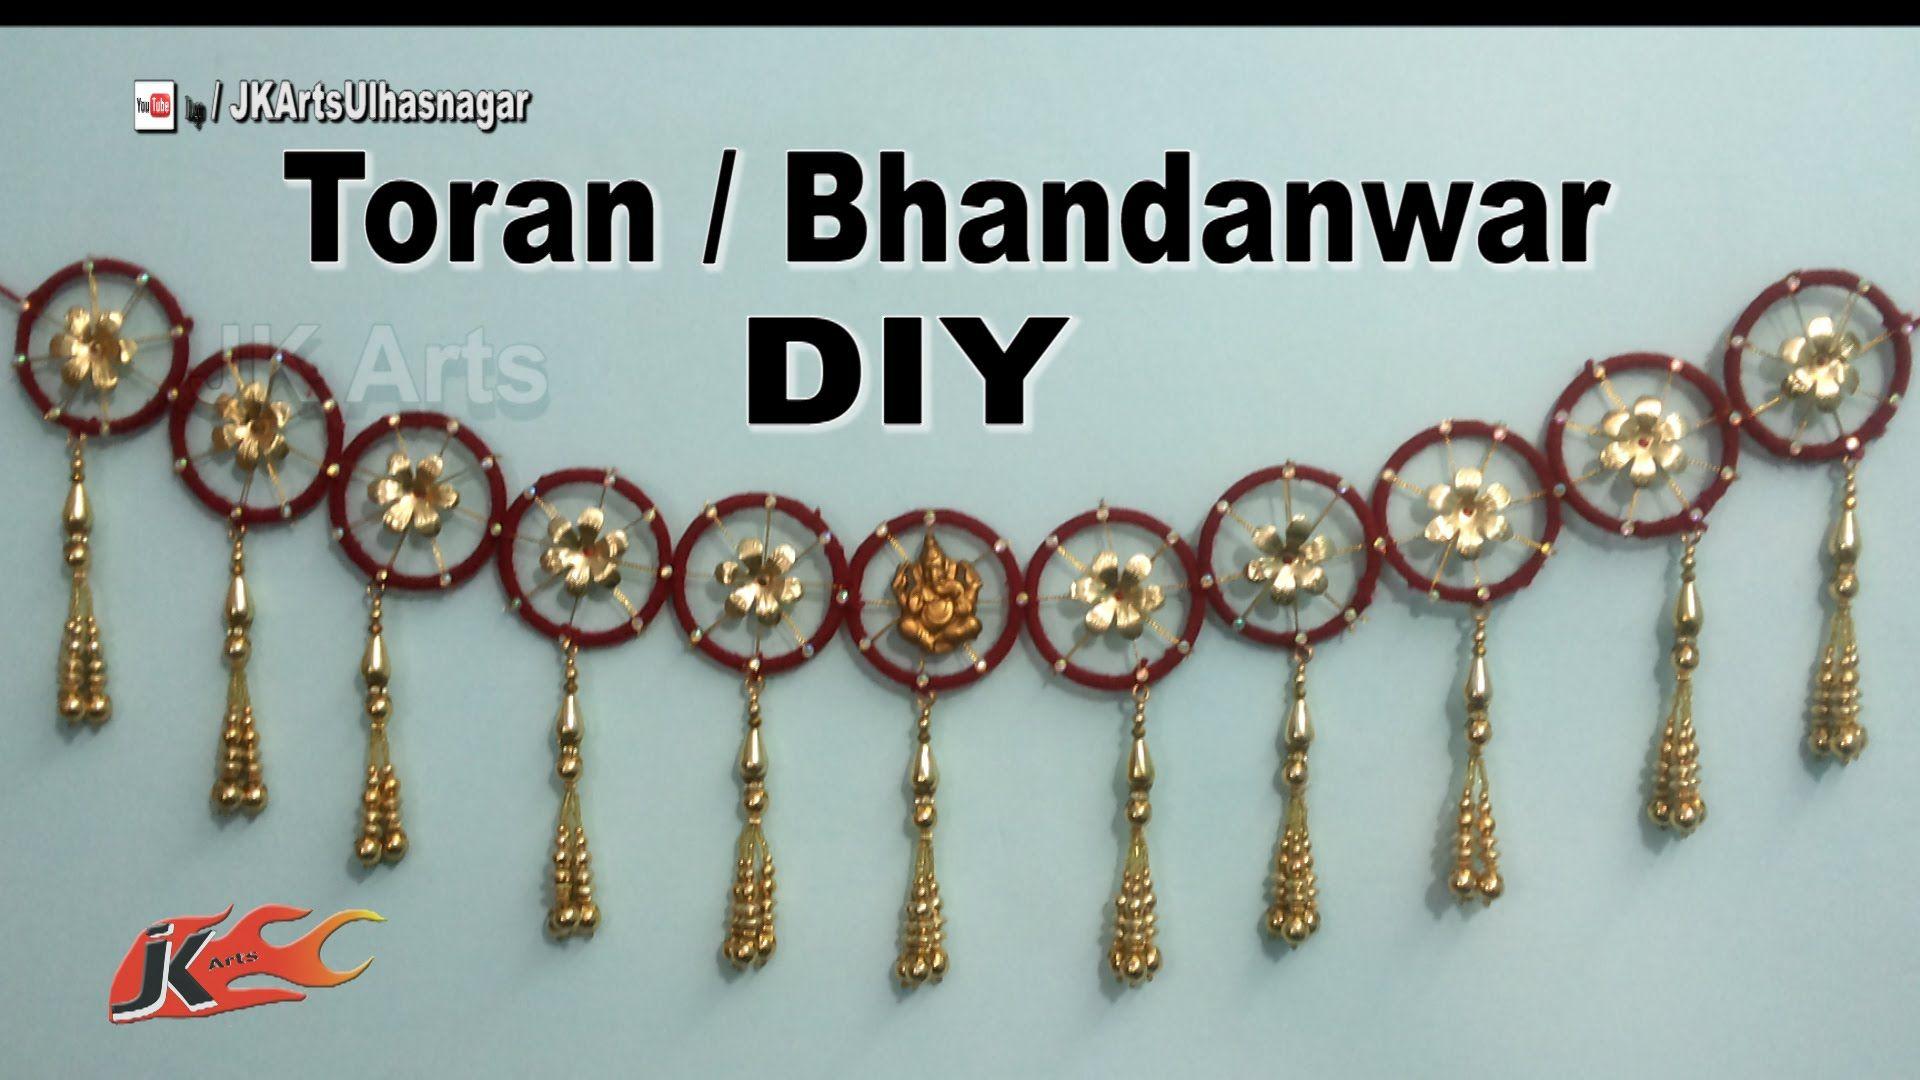 DIY Toran / Bandhanwar from waste bangles | How to make | JK Arts ...